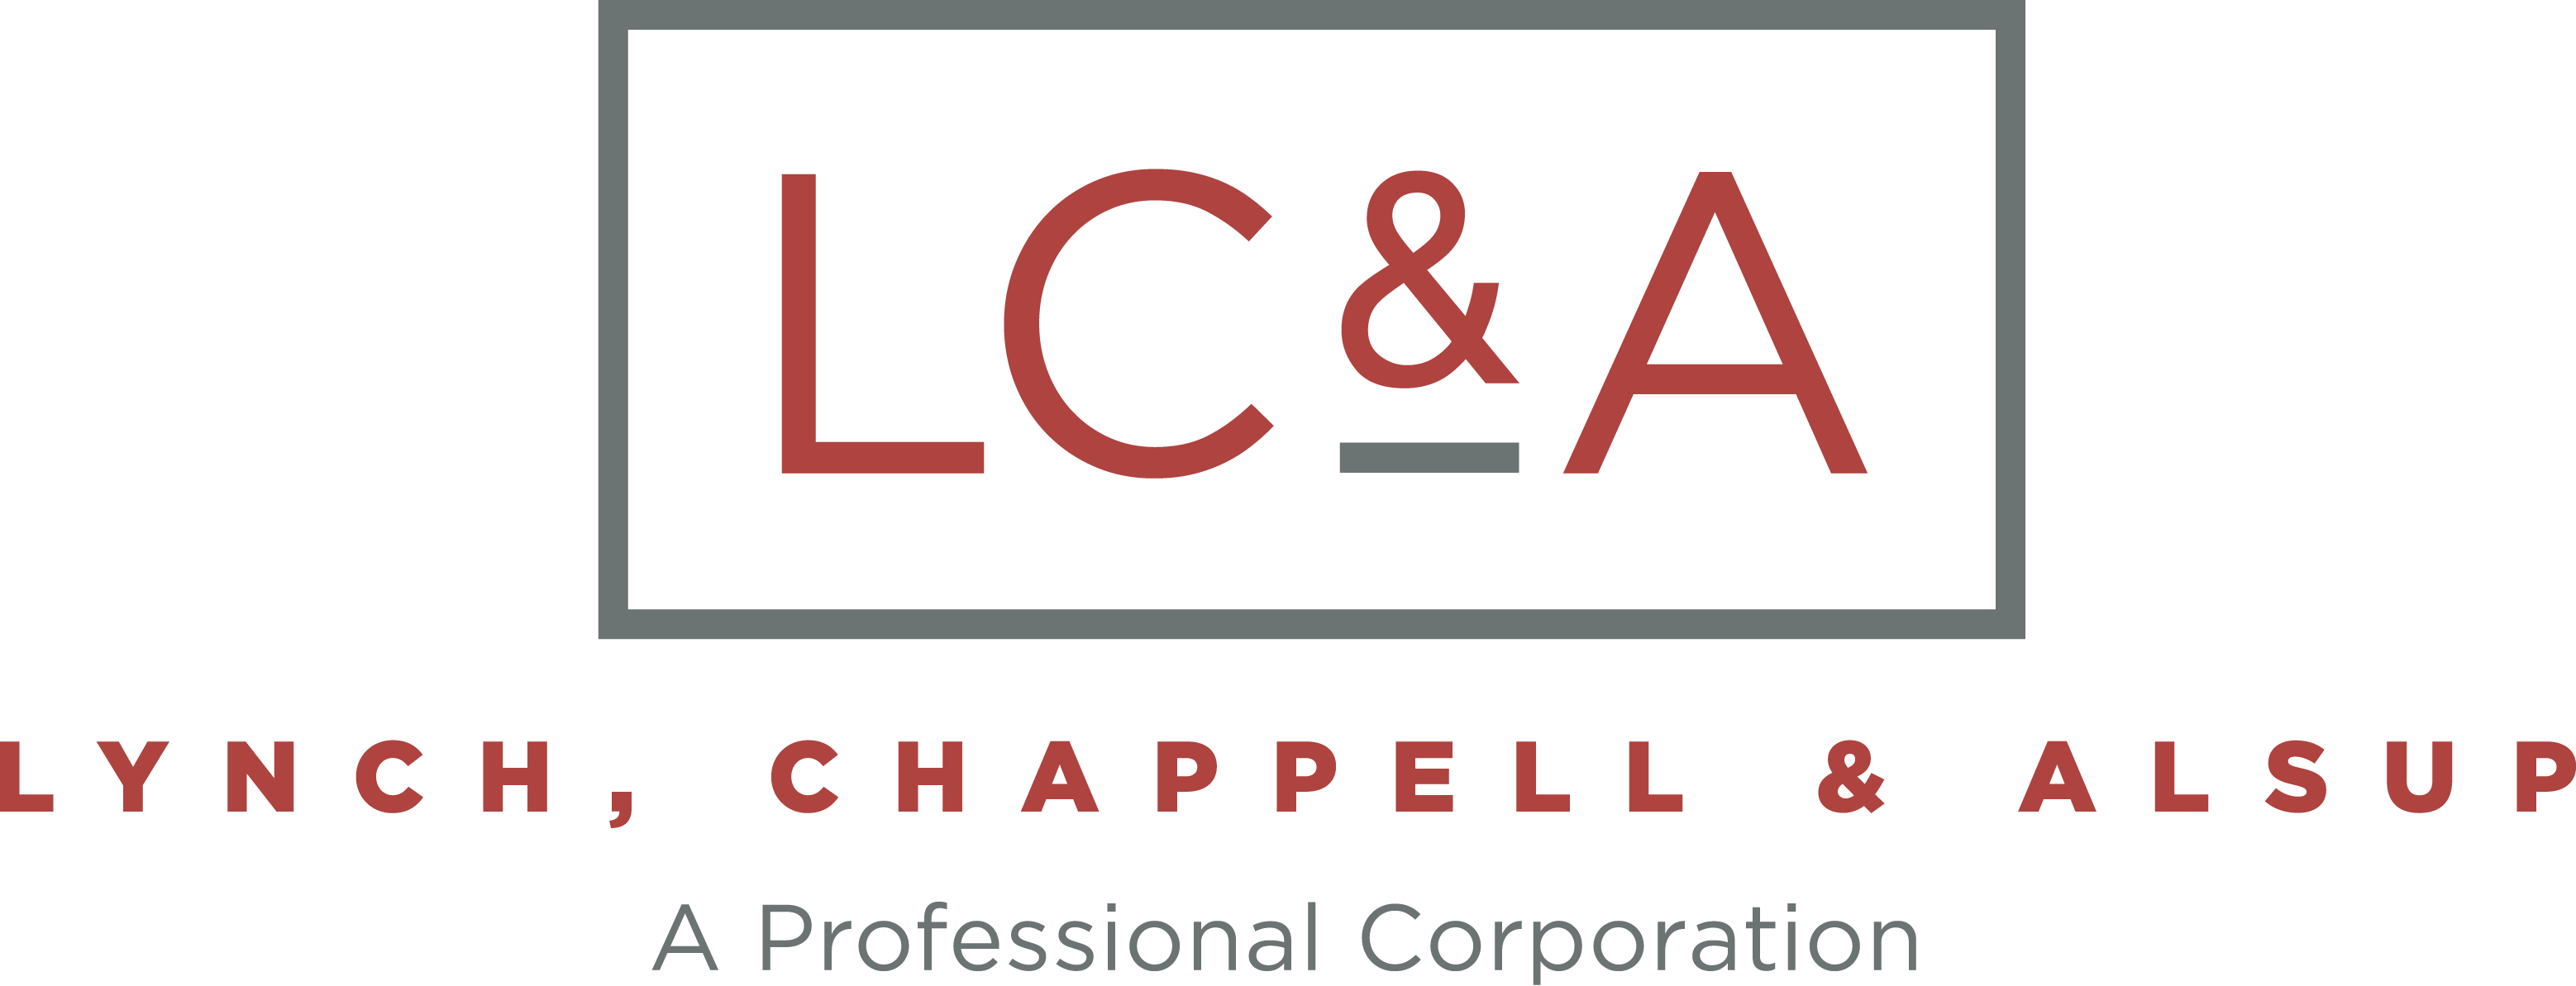 Lynch, Chappell & Alsup